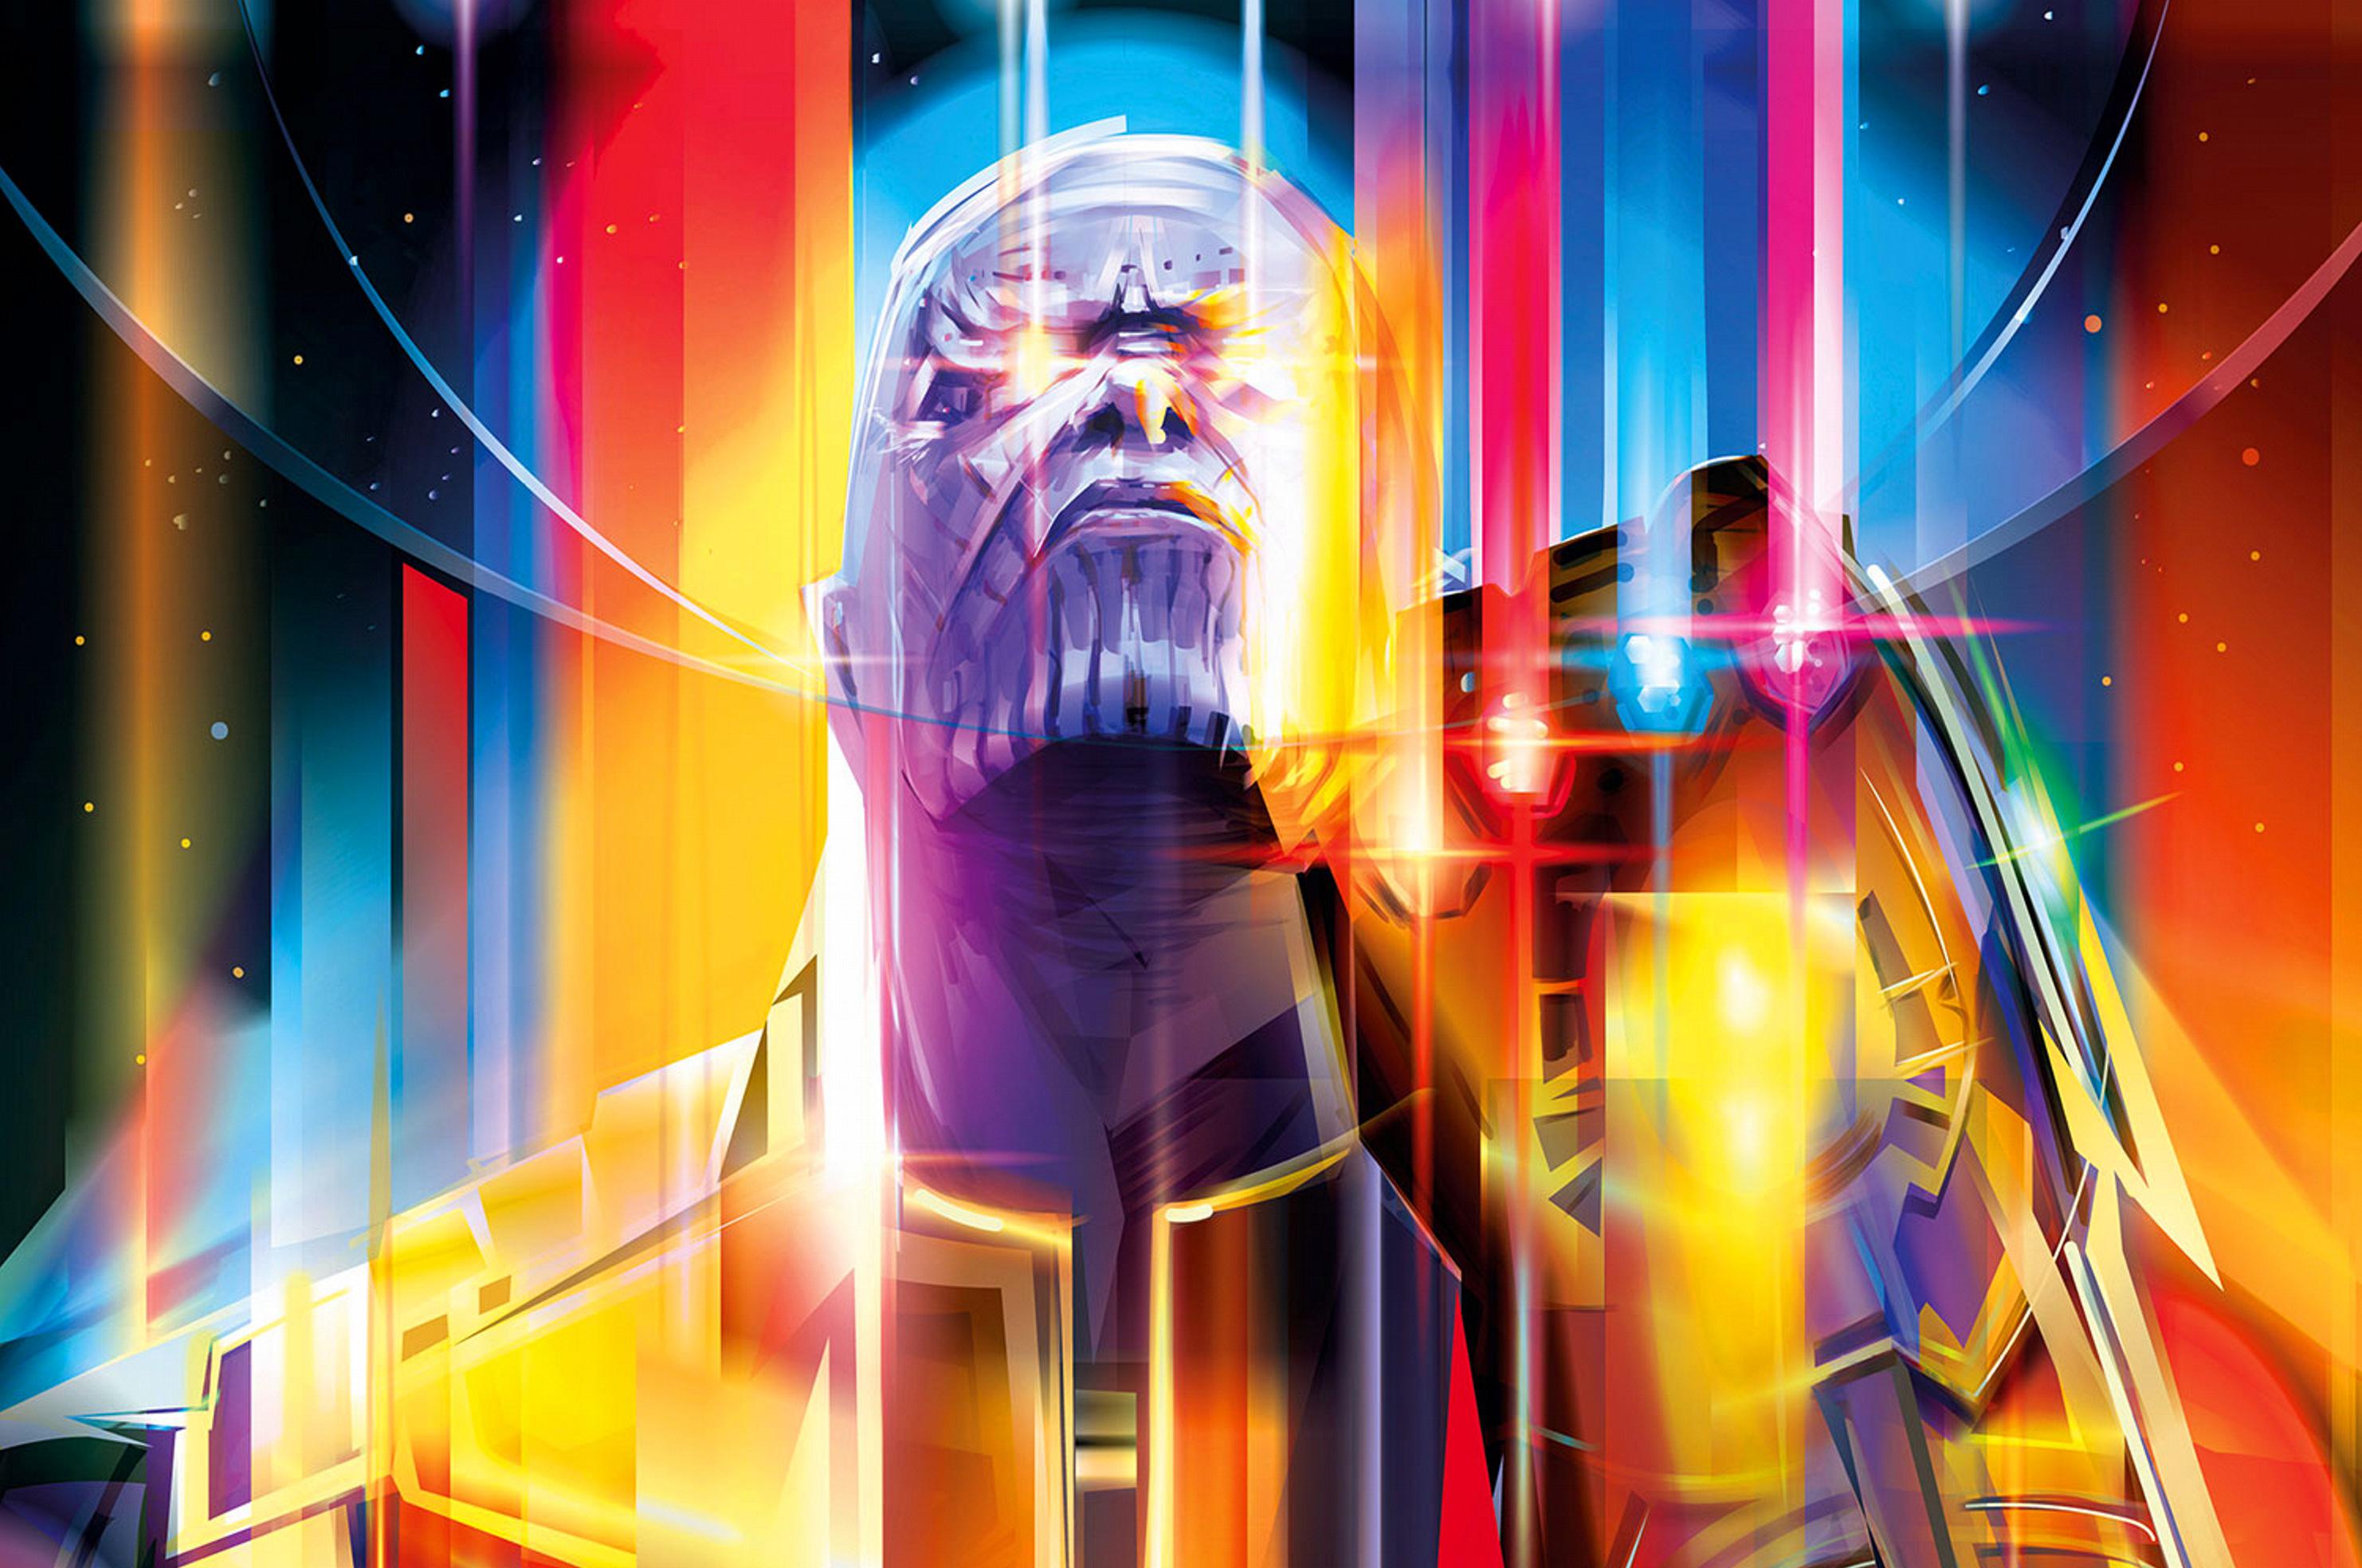 1280x2120 Thanos Avengers Infinity War 2018 Empire IPhone